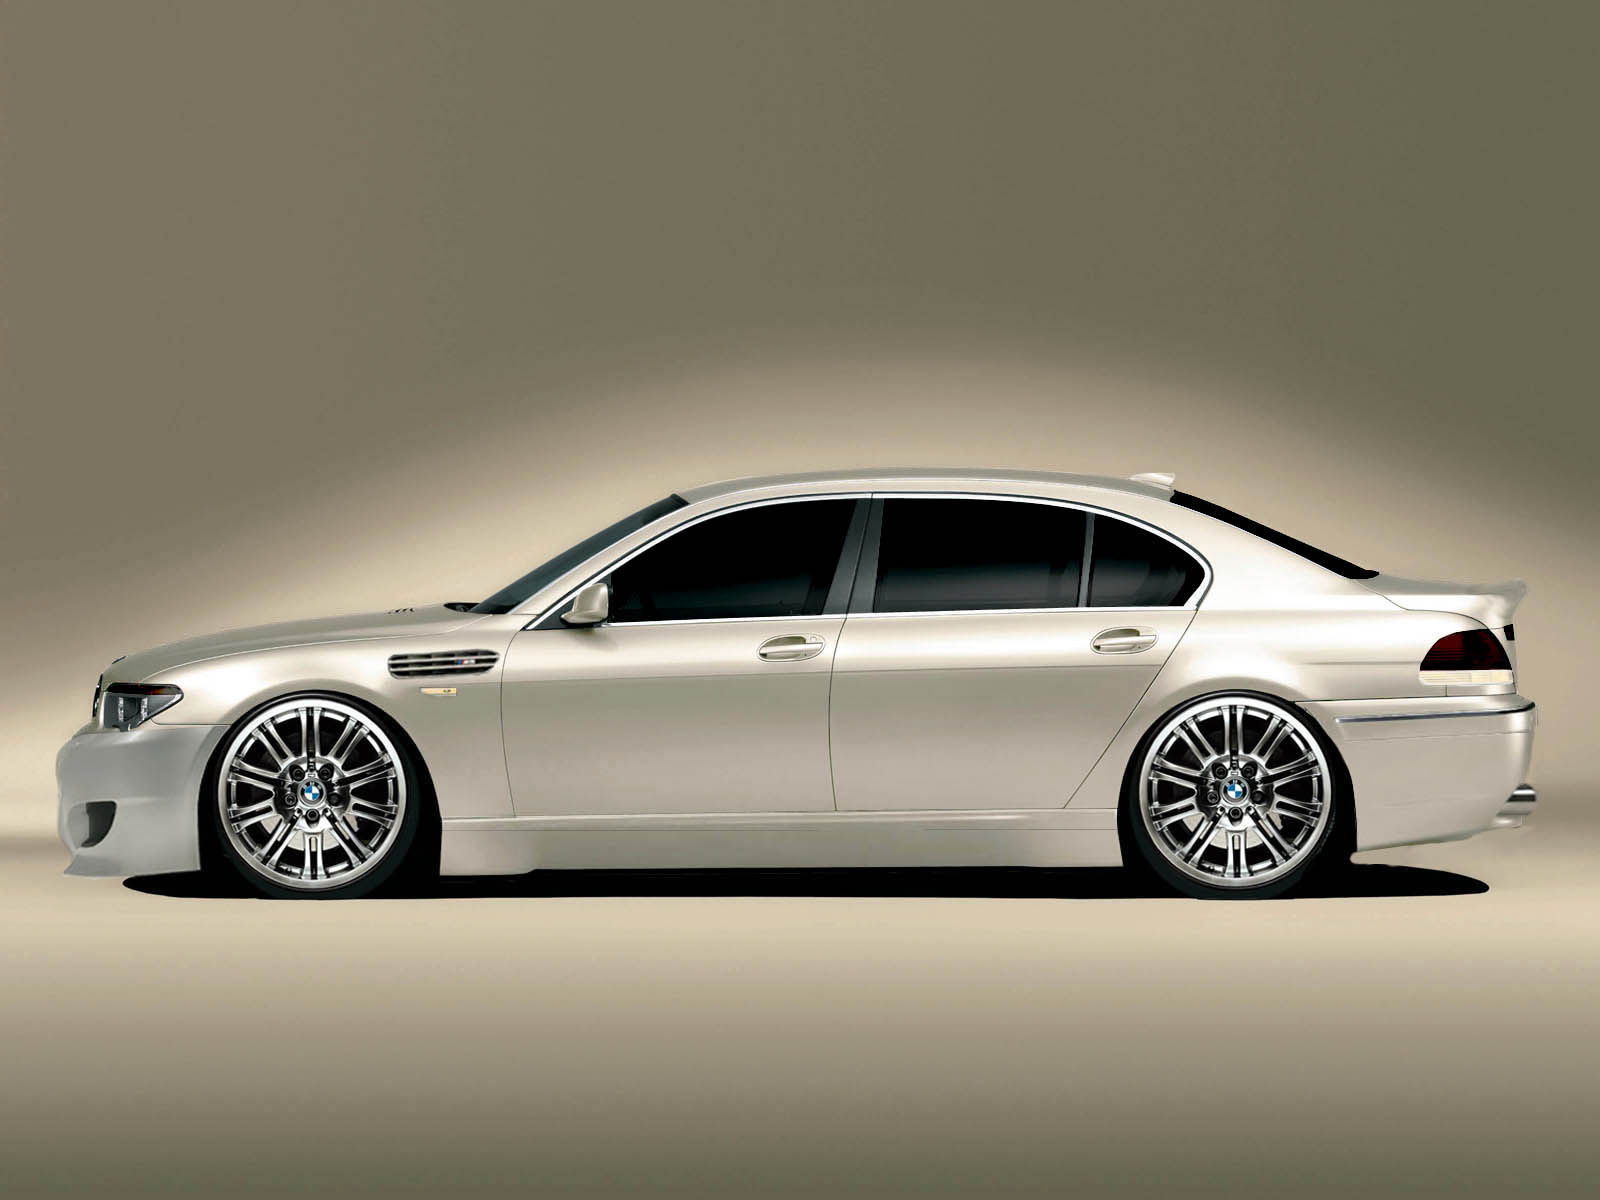 Bmw m7 picture 10 reviews news specs buy car